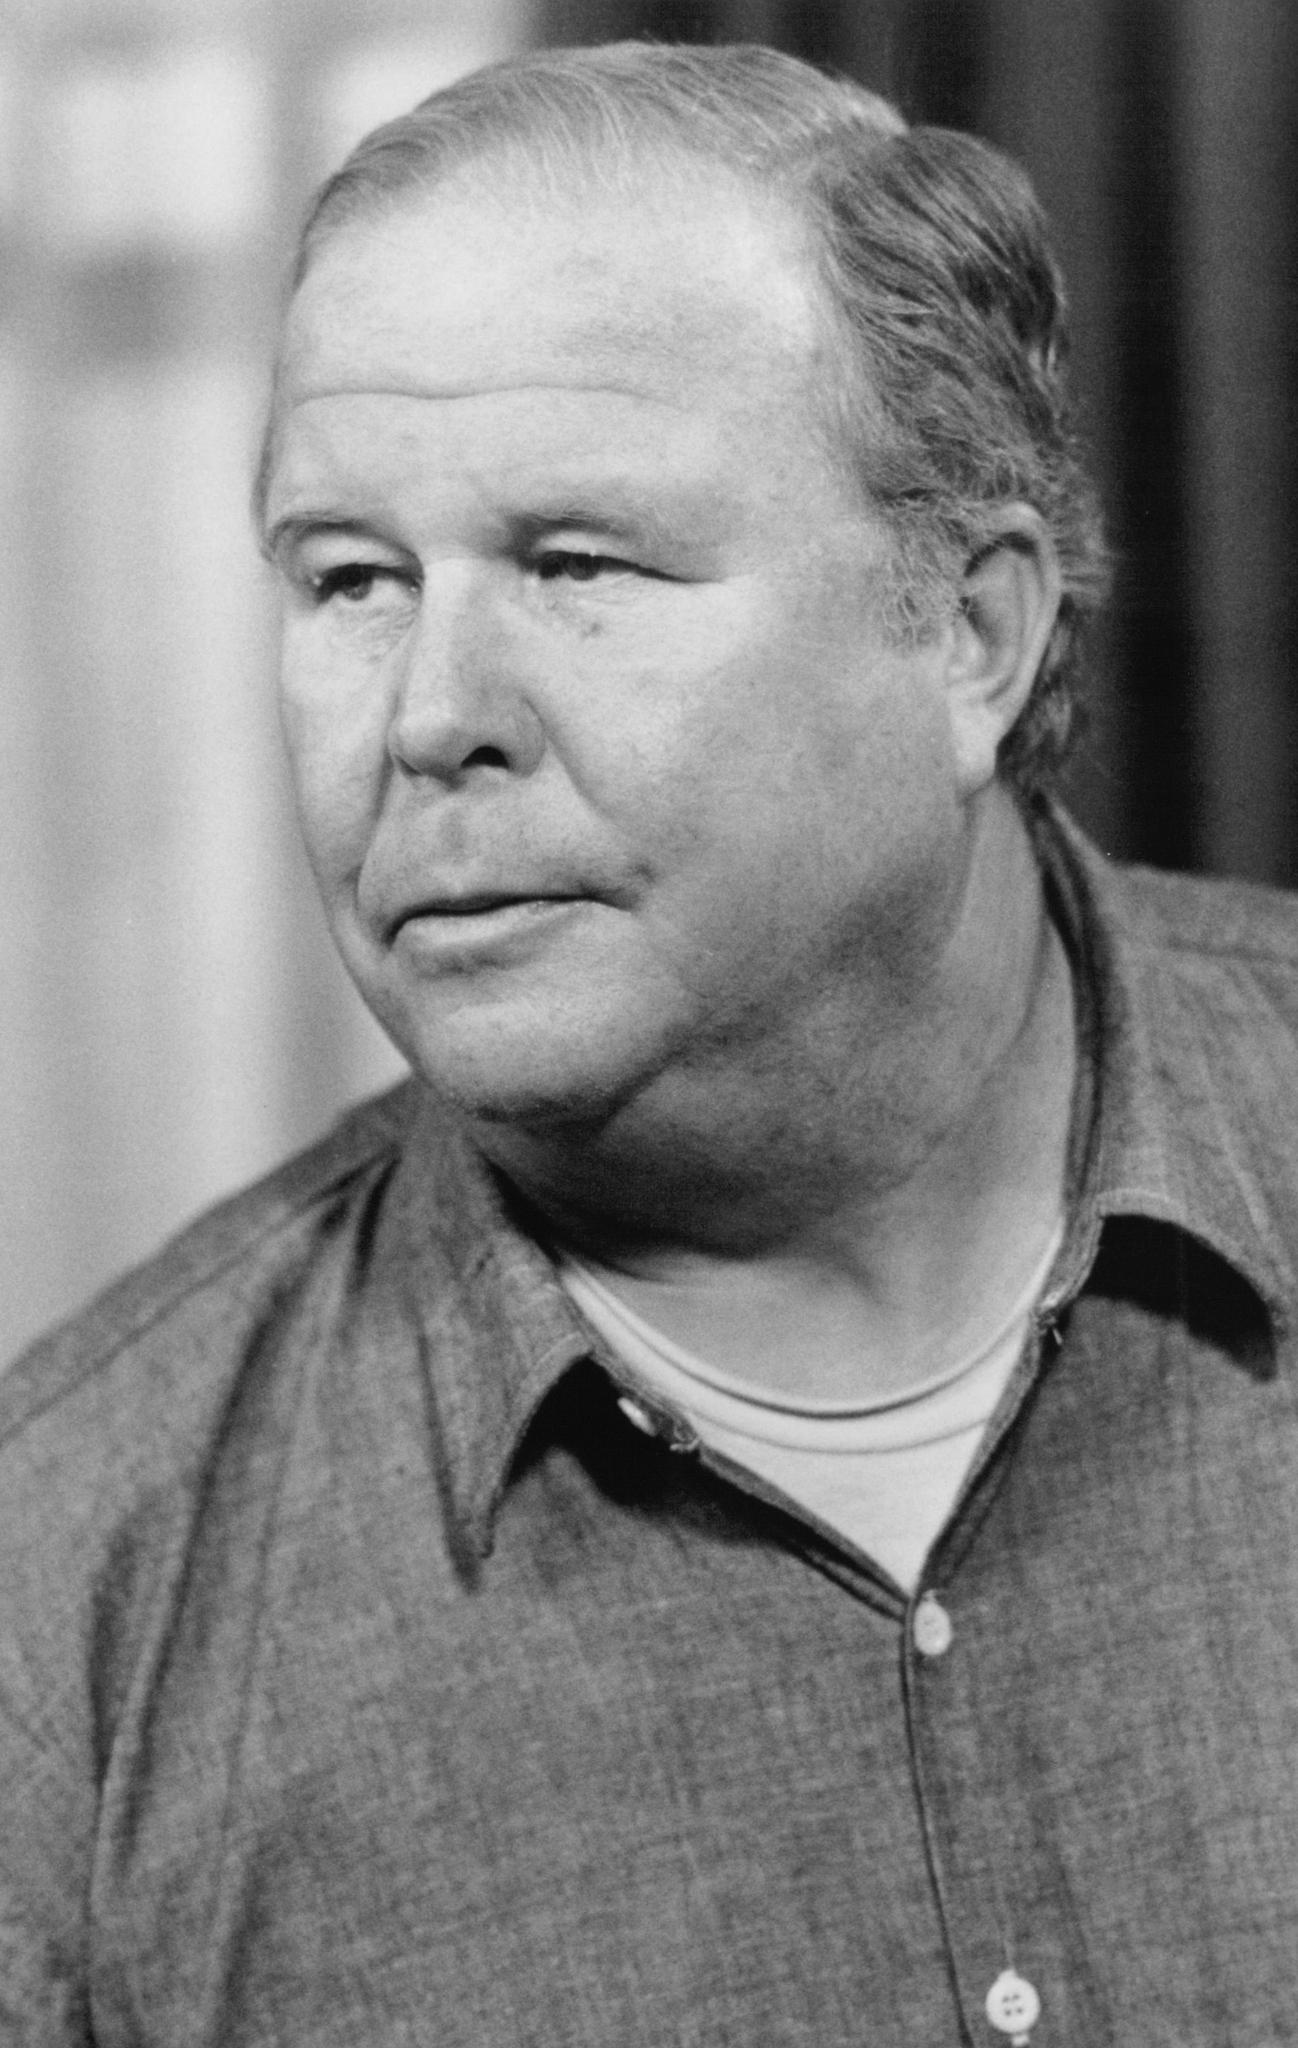 Ned Beatty, Amerikalı aktör tarihte bugün